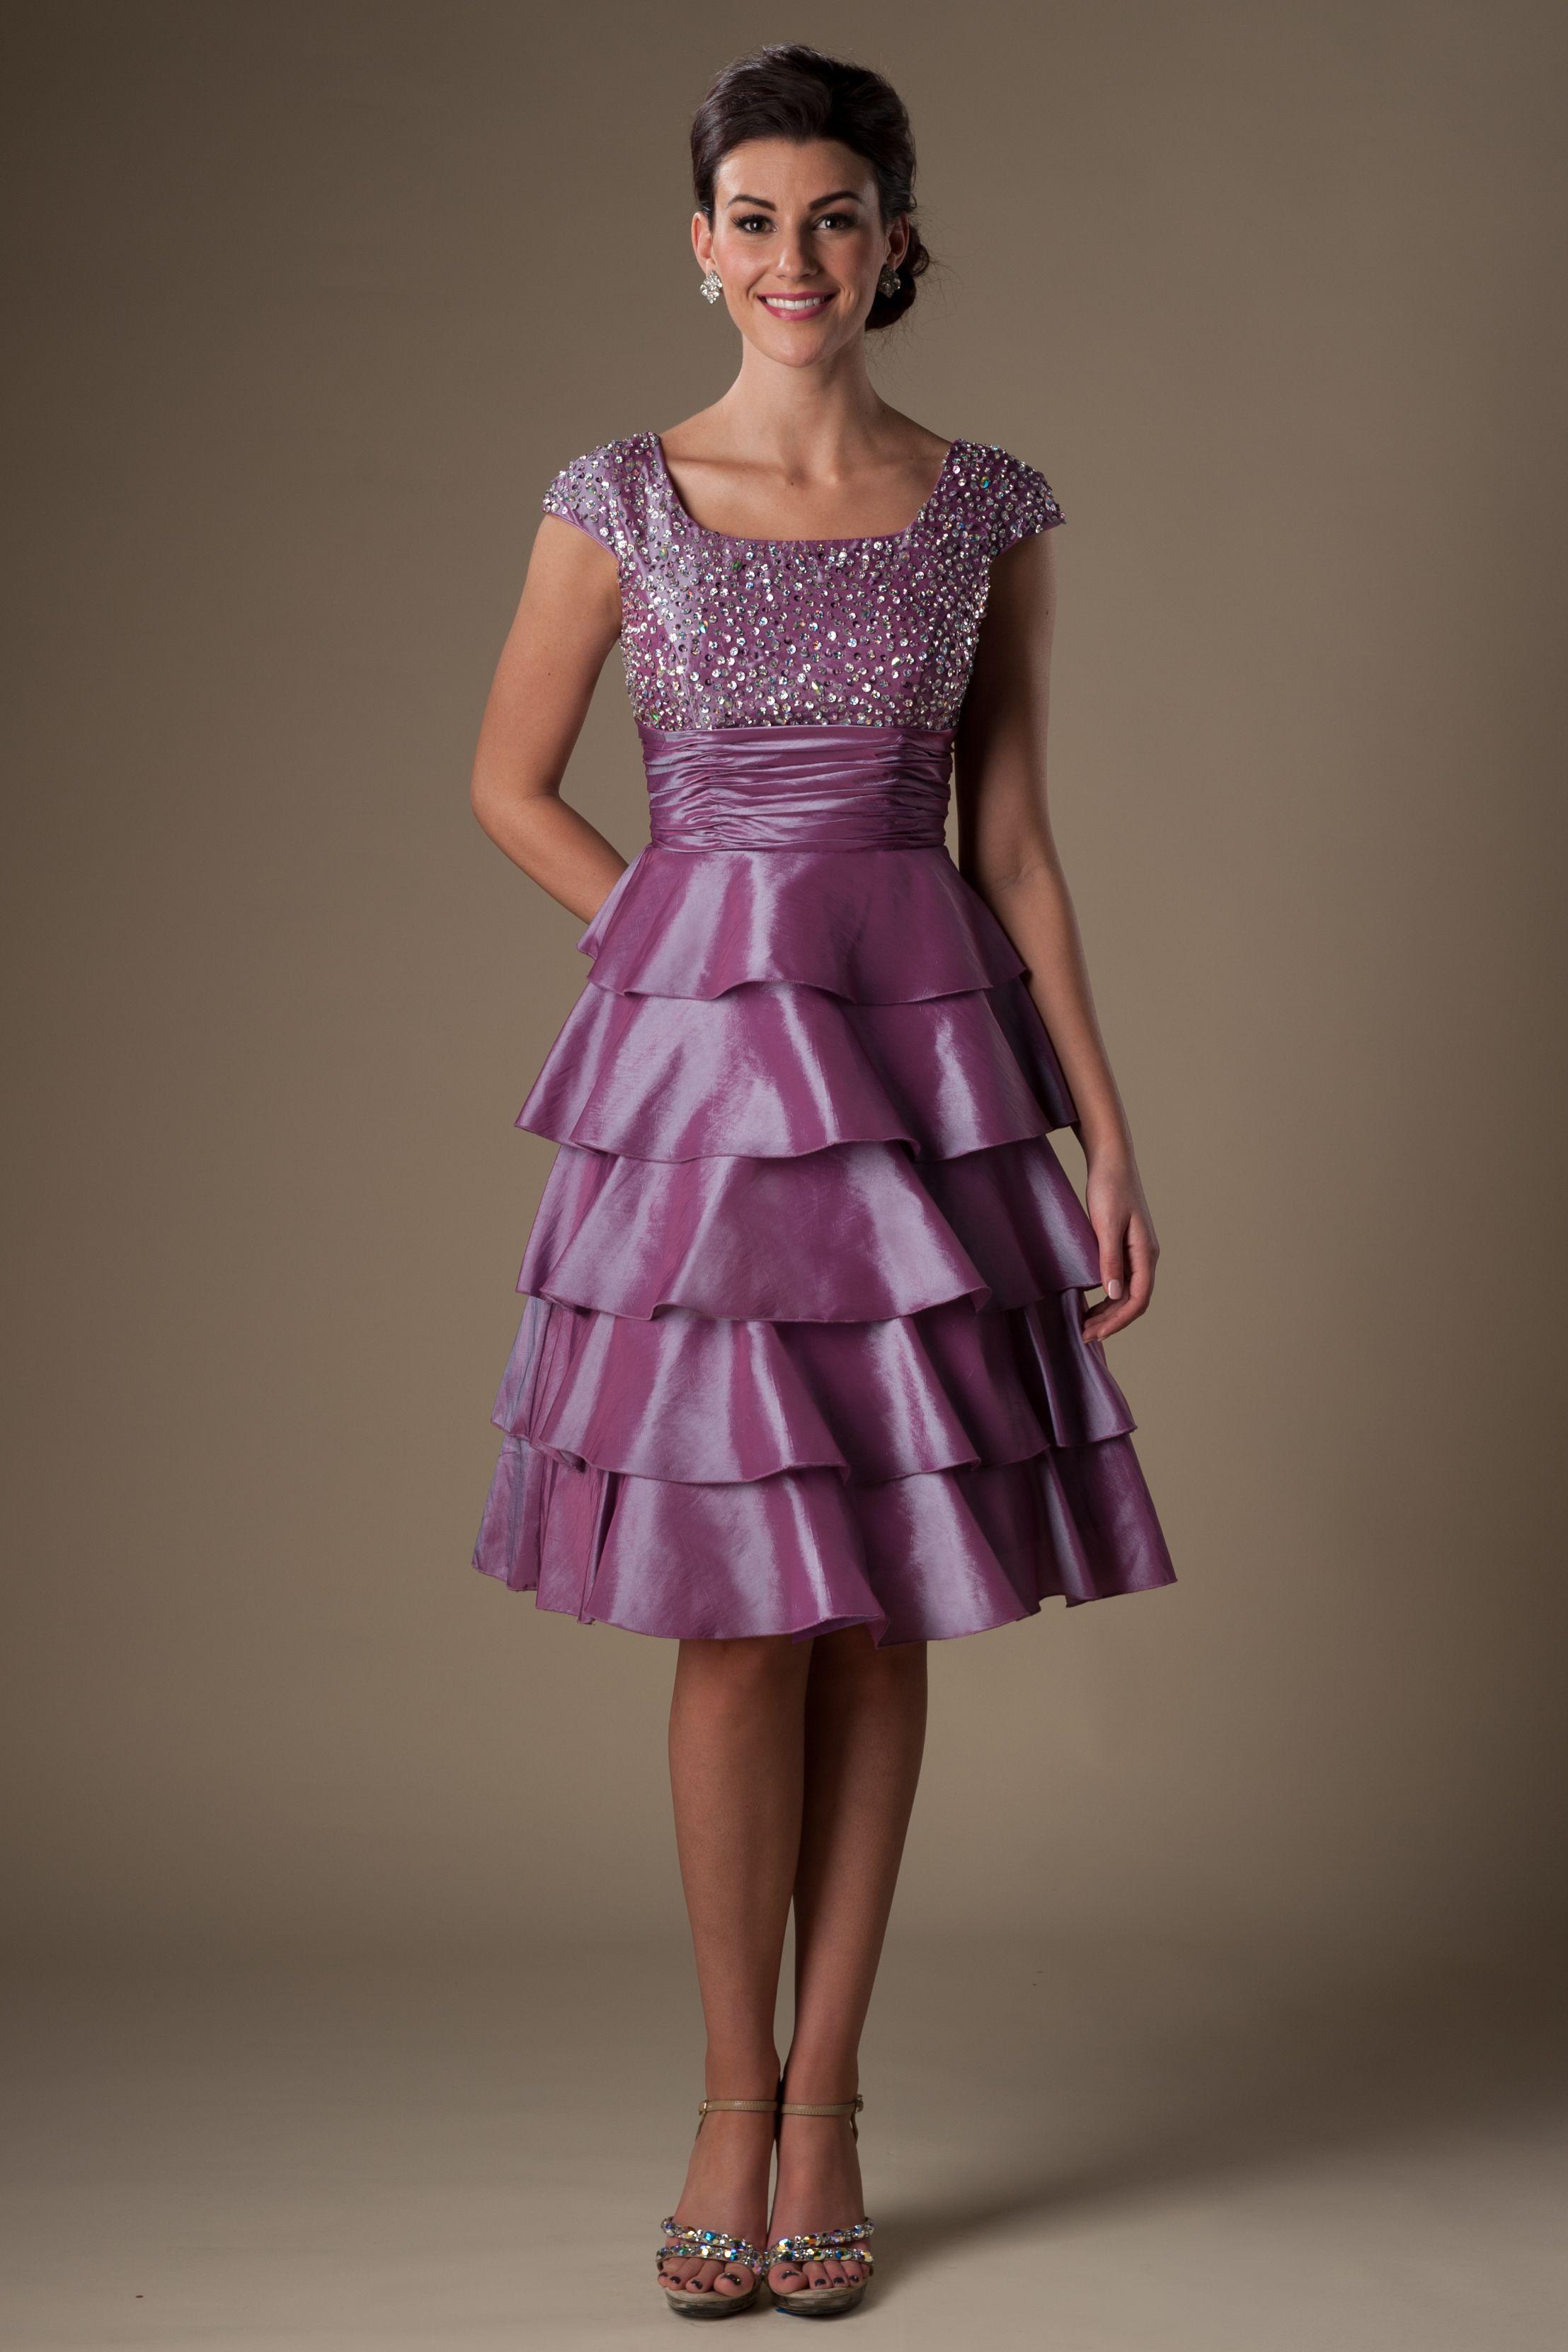 Modest Homecoming 2015 | Modest Homecoming Dresses 2015 | Pinterest ...